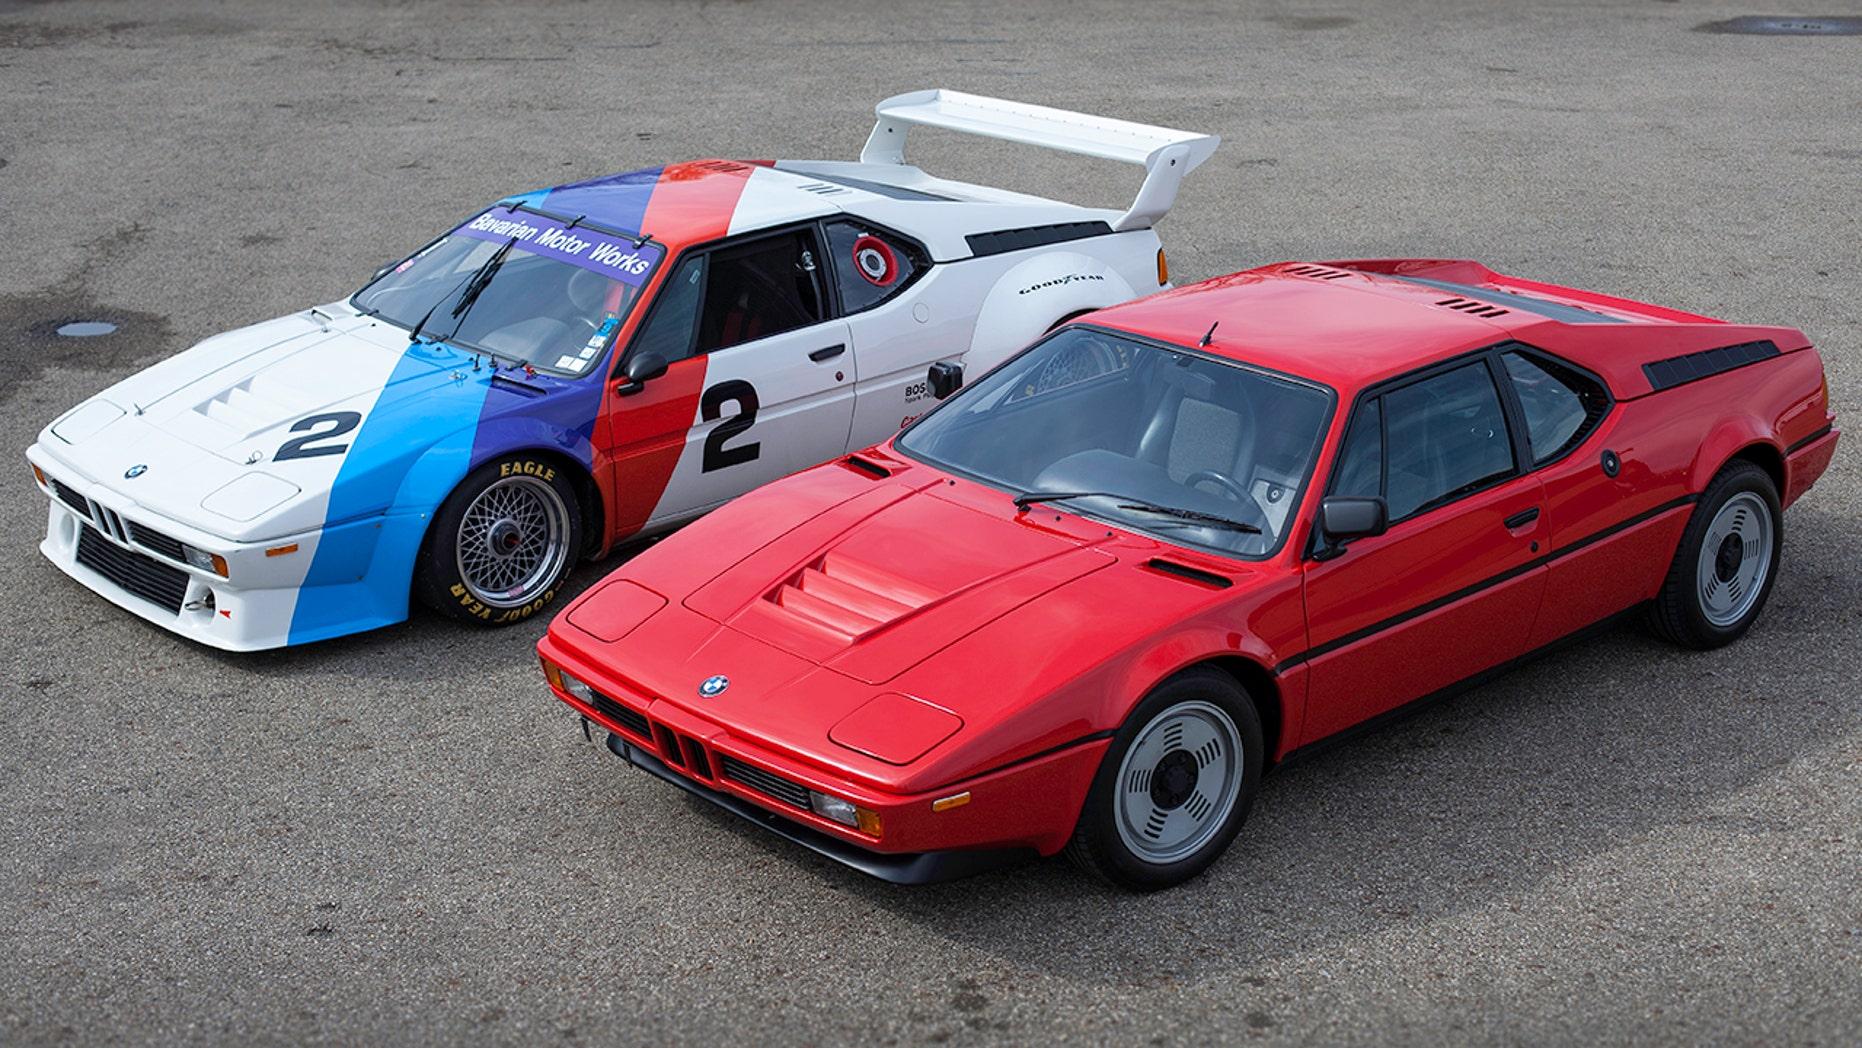 Pair of BMW M1s